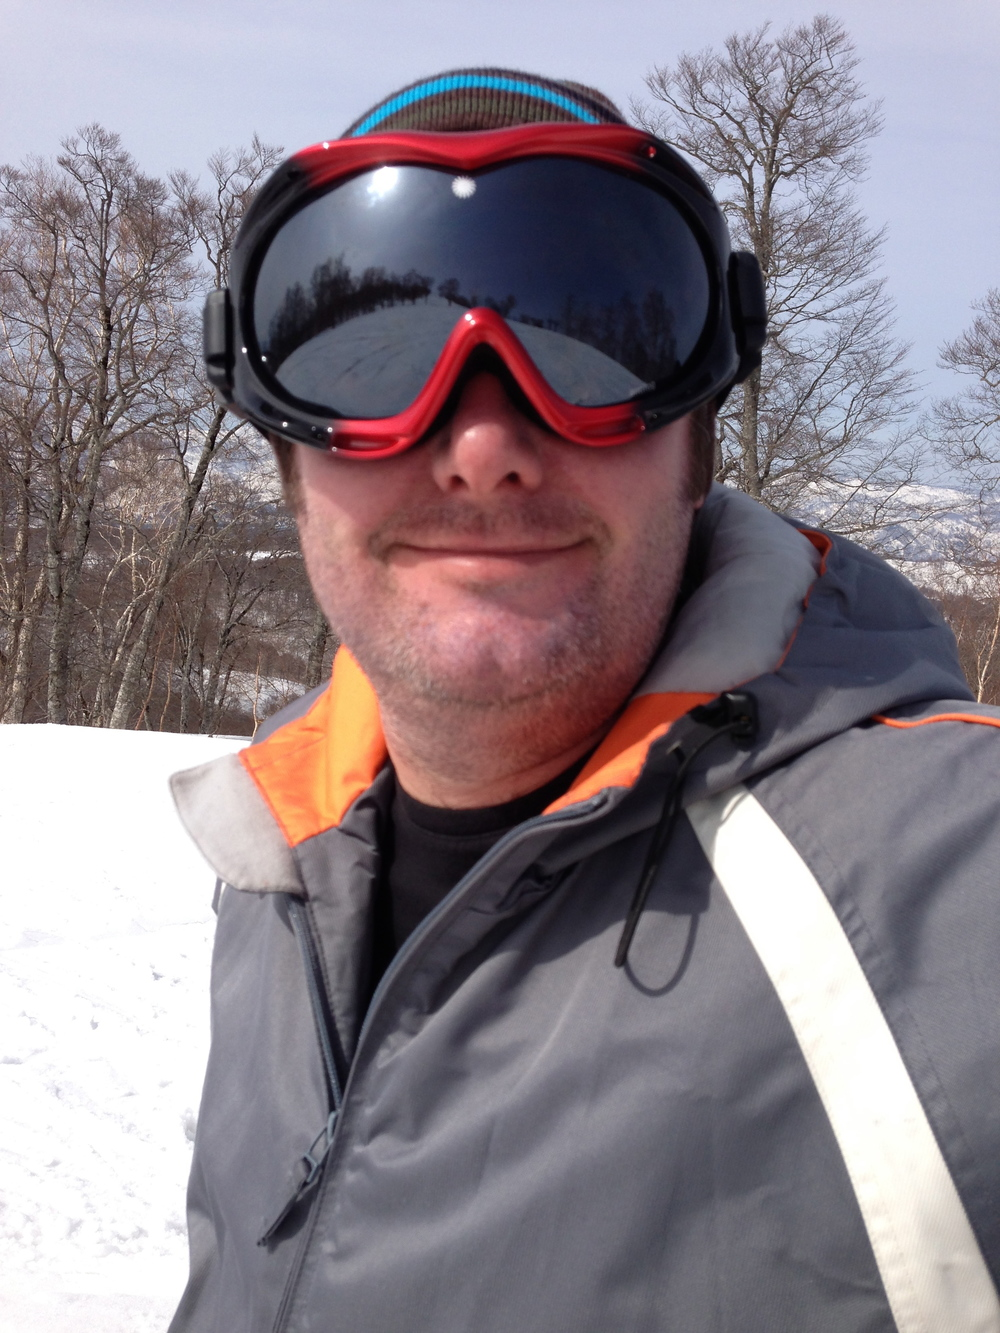 Simon loves skiing